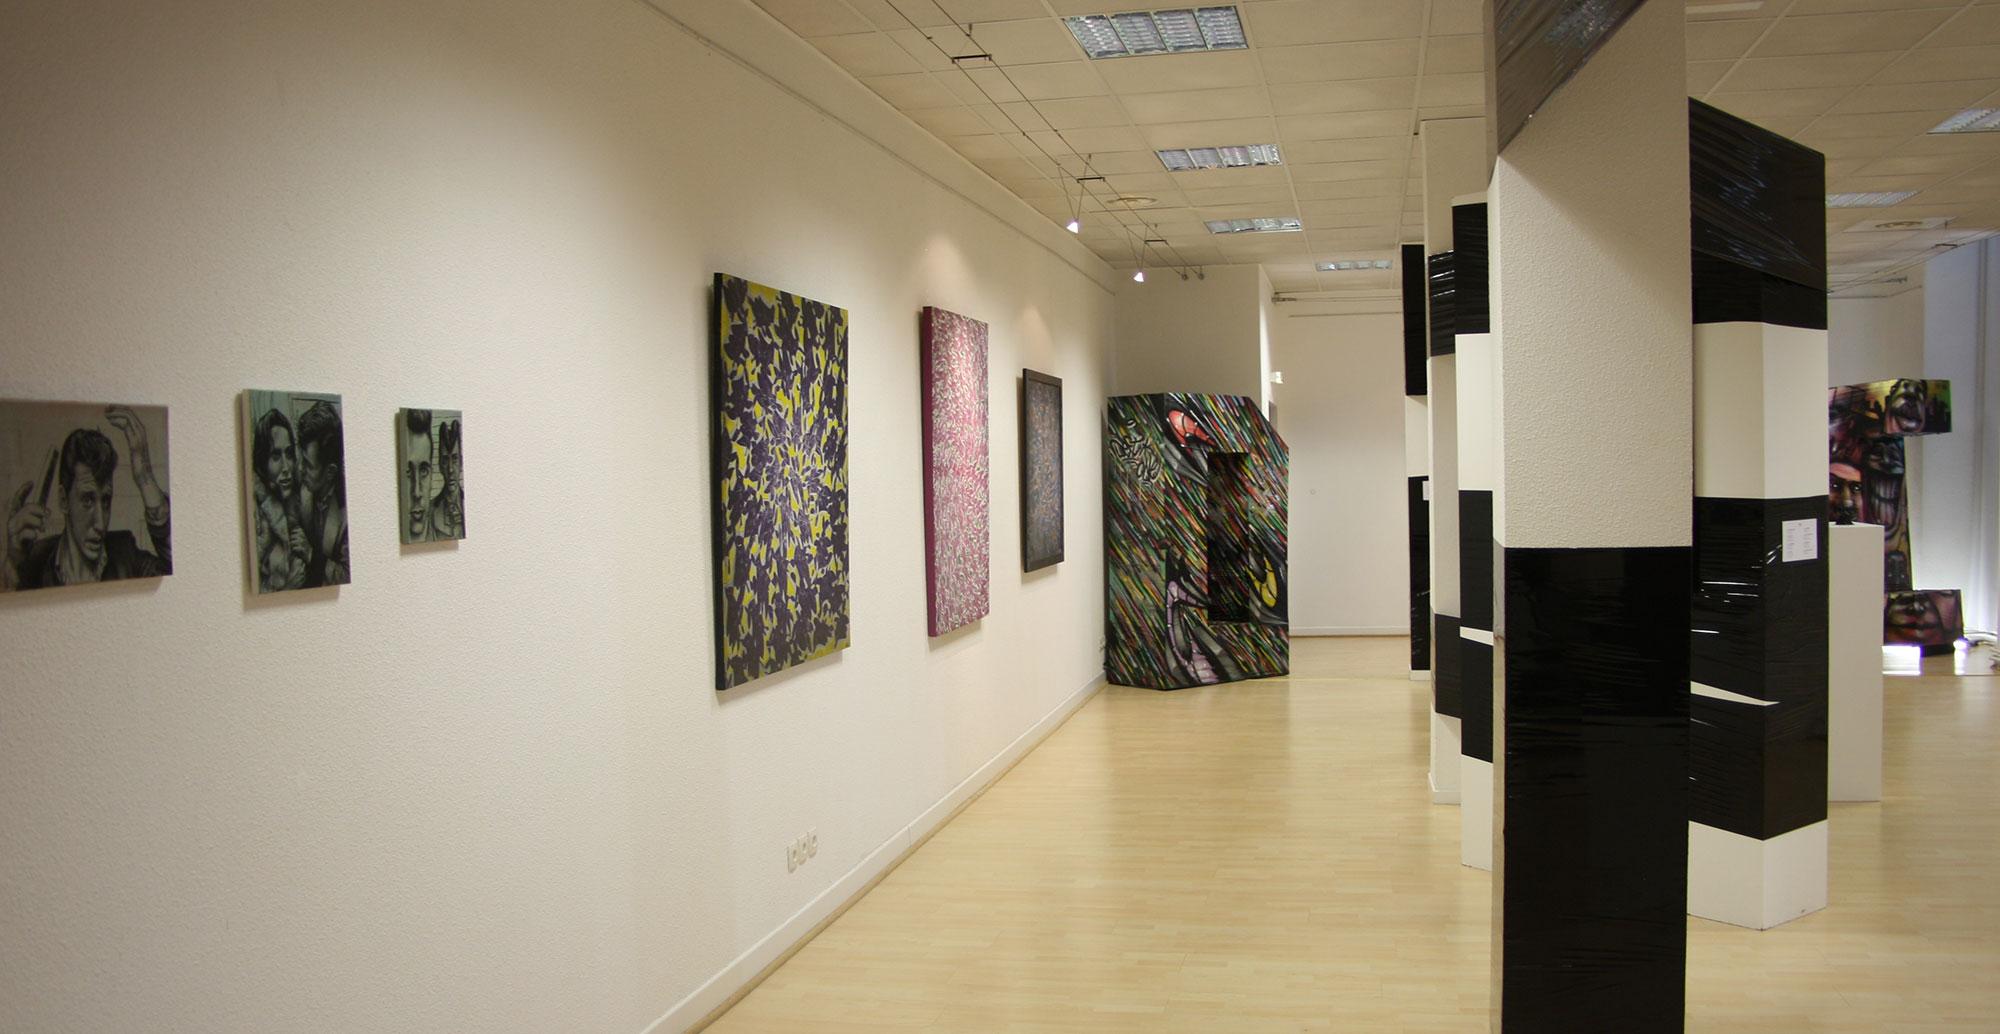 Deft - Exposition Camille Claudel  - Clermont Ferrand